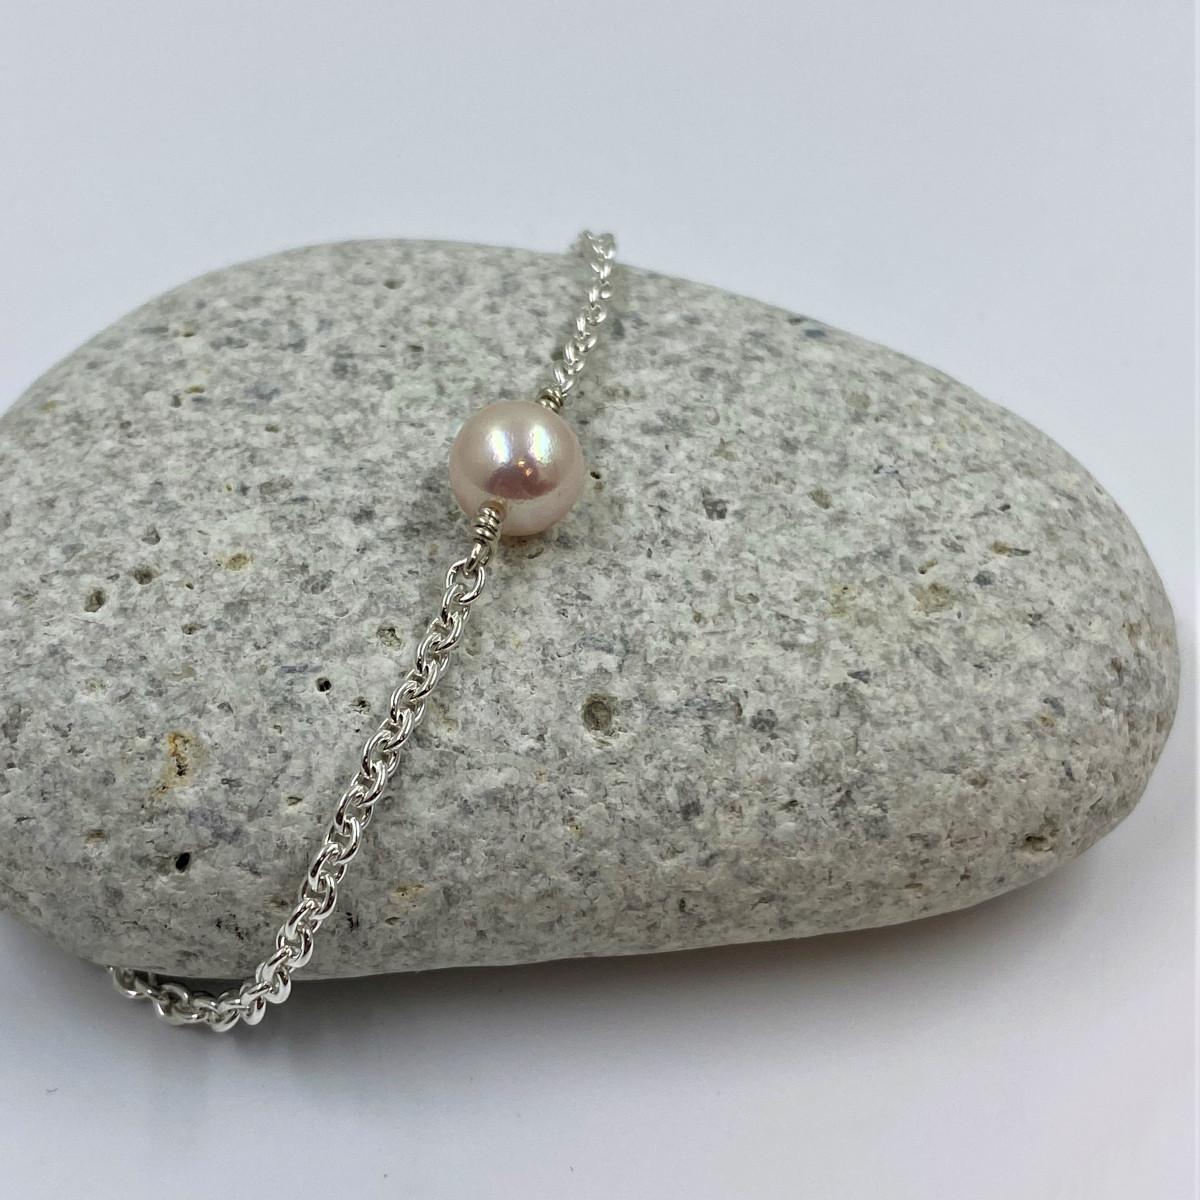 Silverarmband, armband i silver, sötvattenspärla